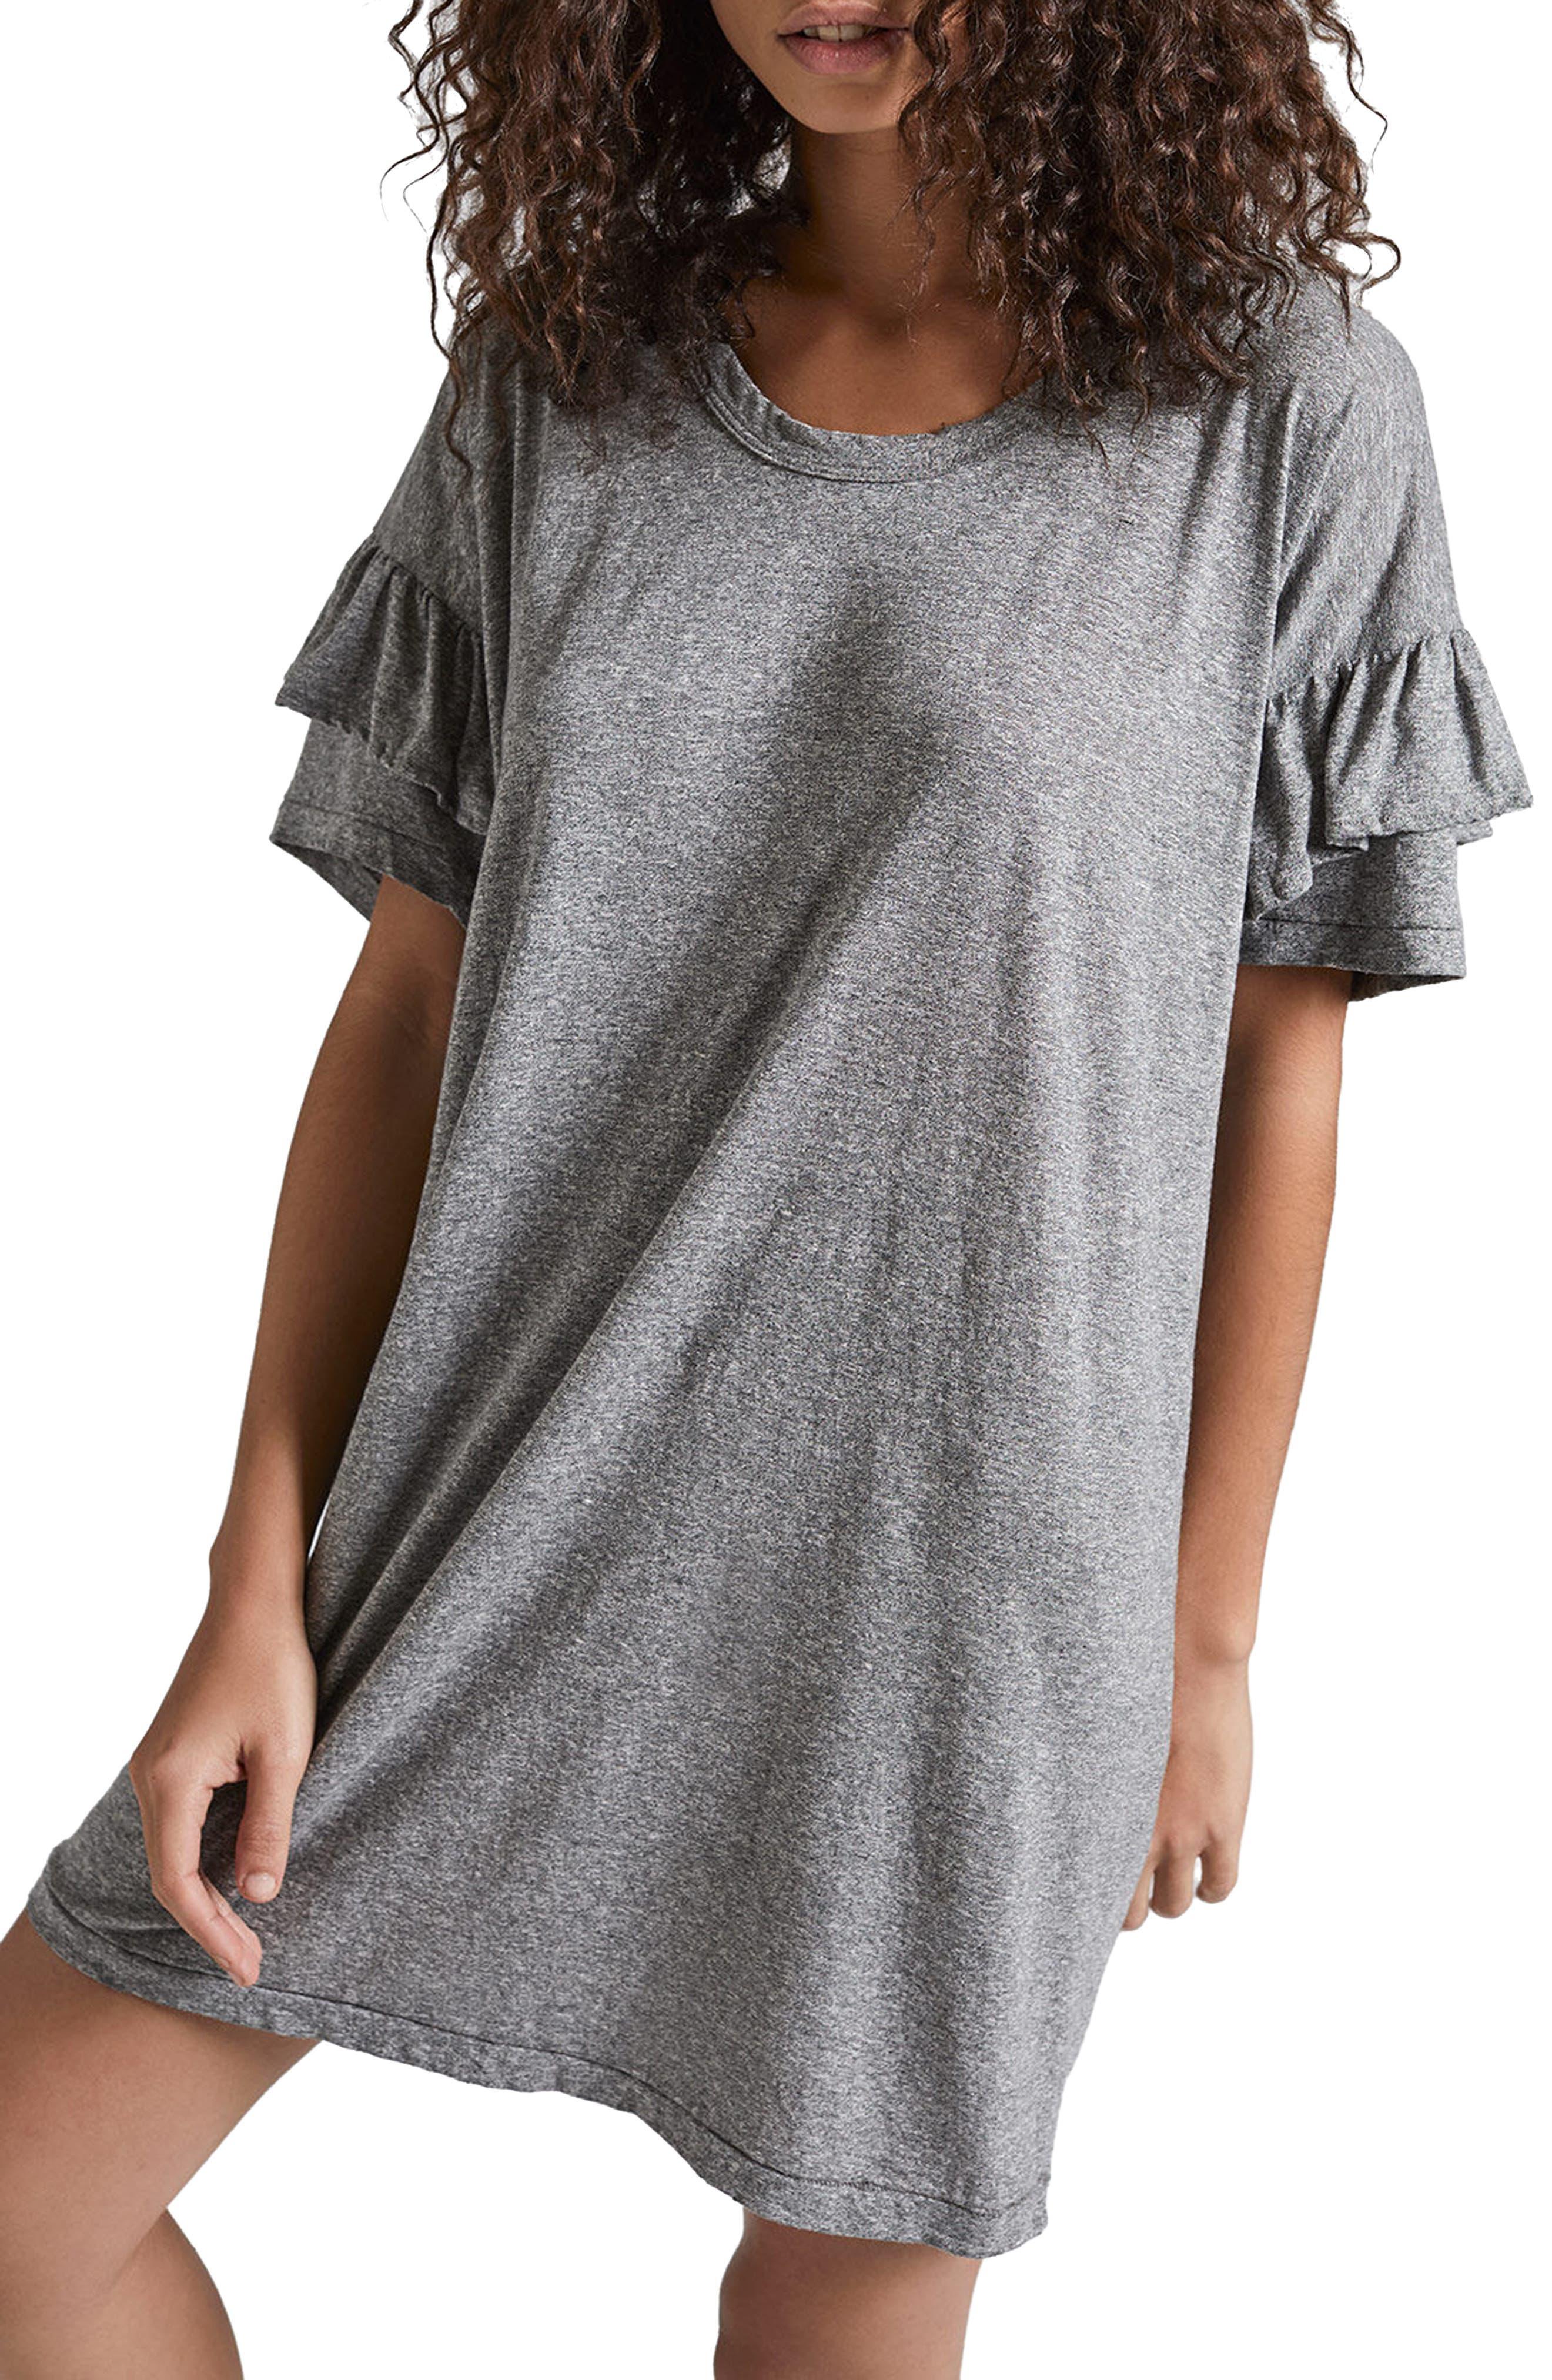 Ruffle Roadie T-Shirt Dress,                             Main thumbnail 1, color,                             Heather Grey